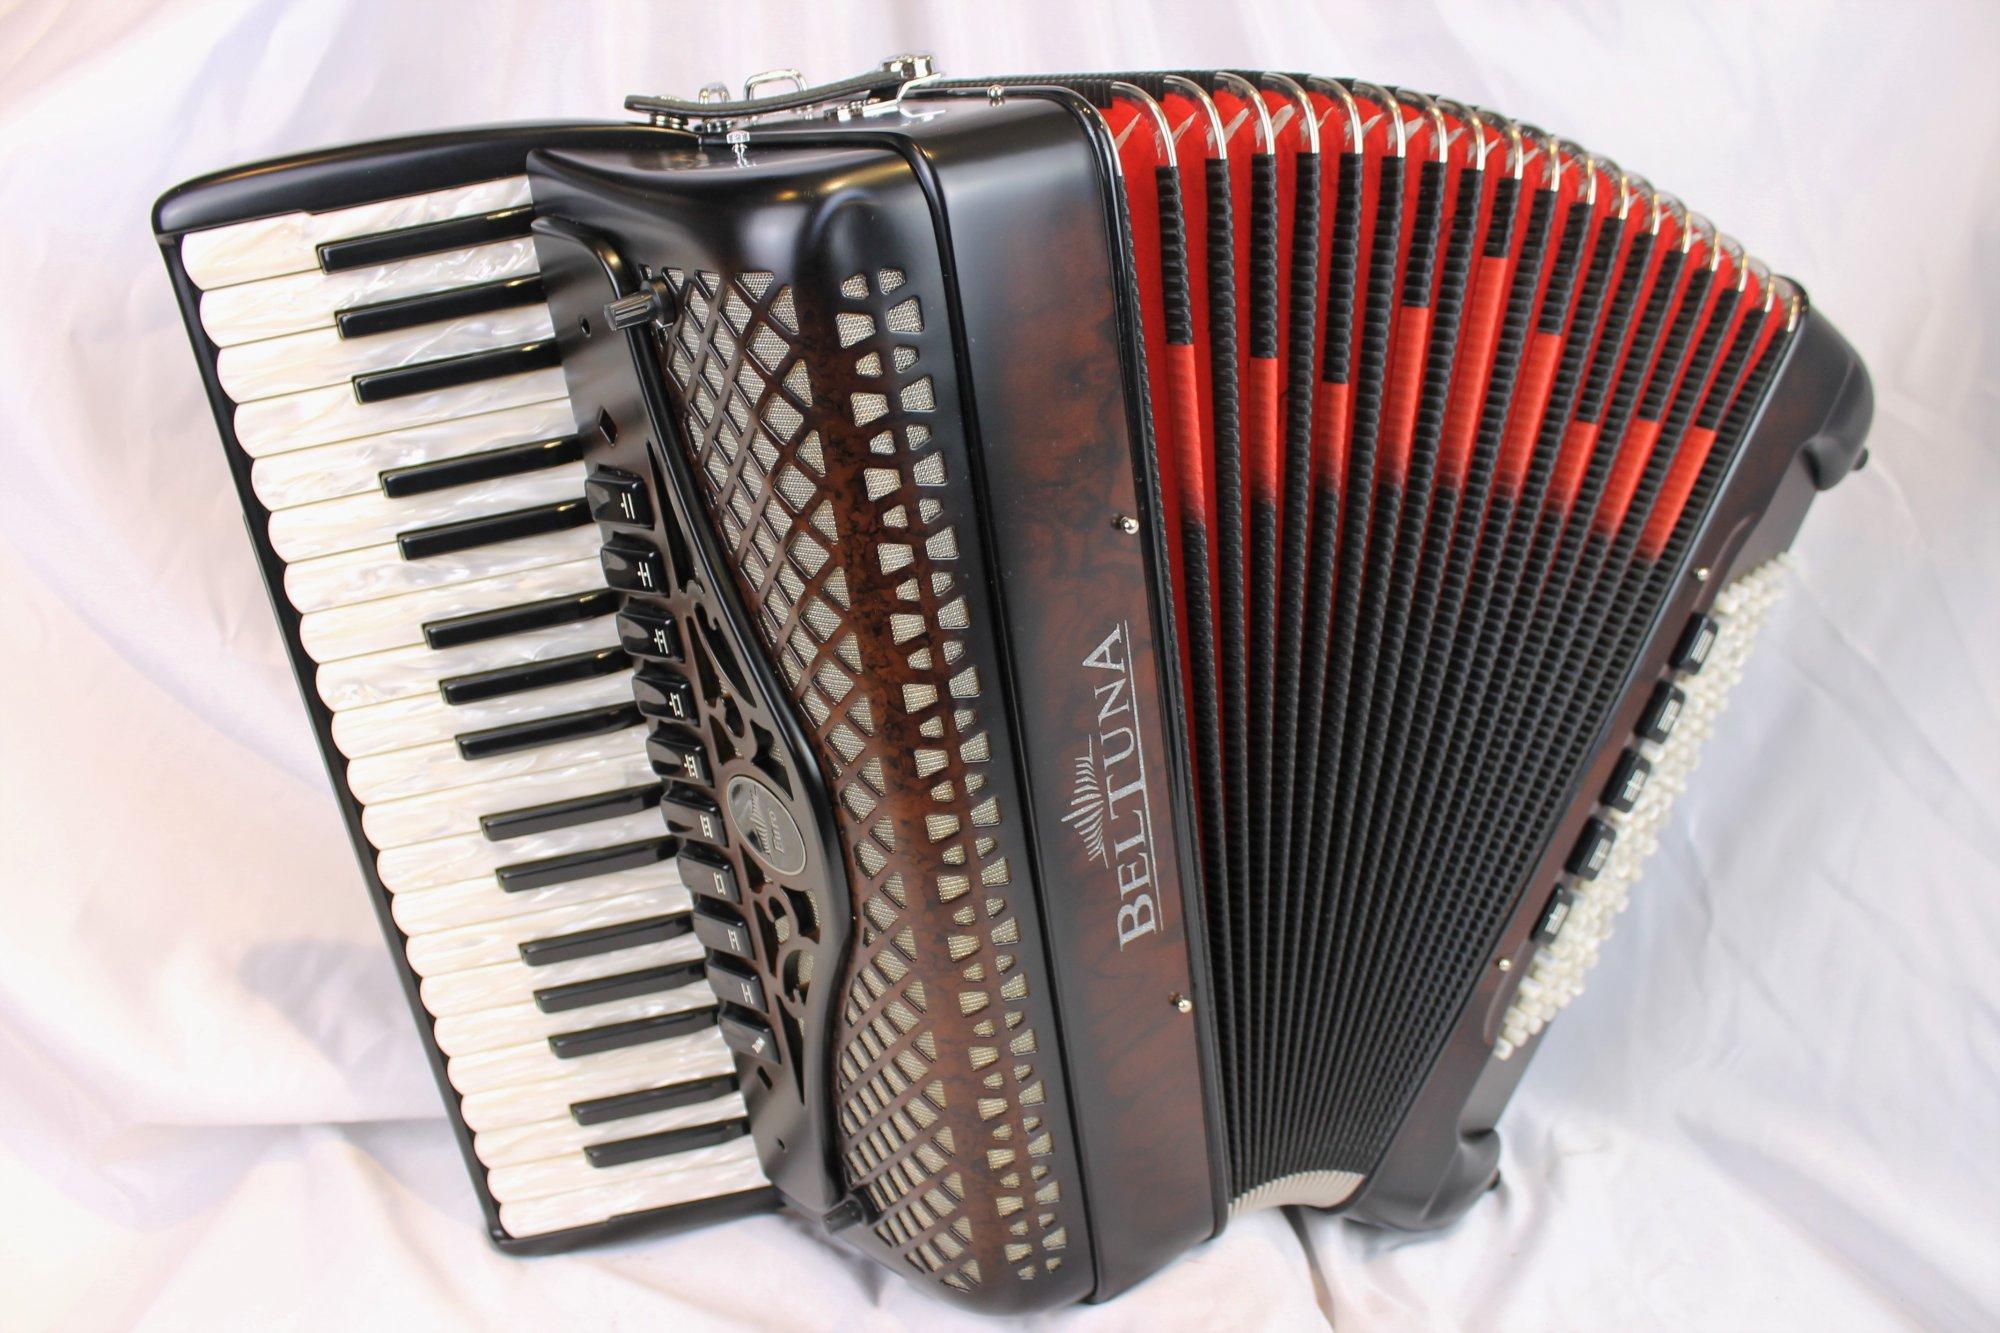 NEW Dark Chocolate Beltuna Euro IV Piano Accordion LMMM 37 96